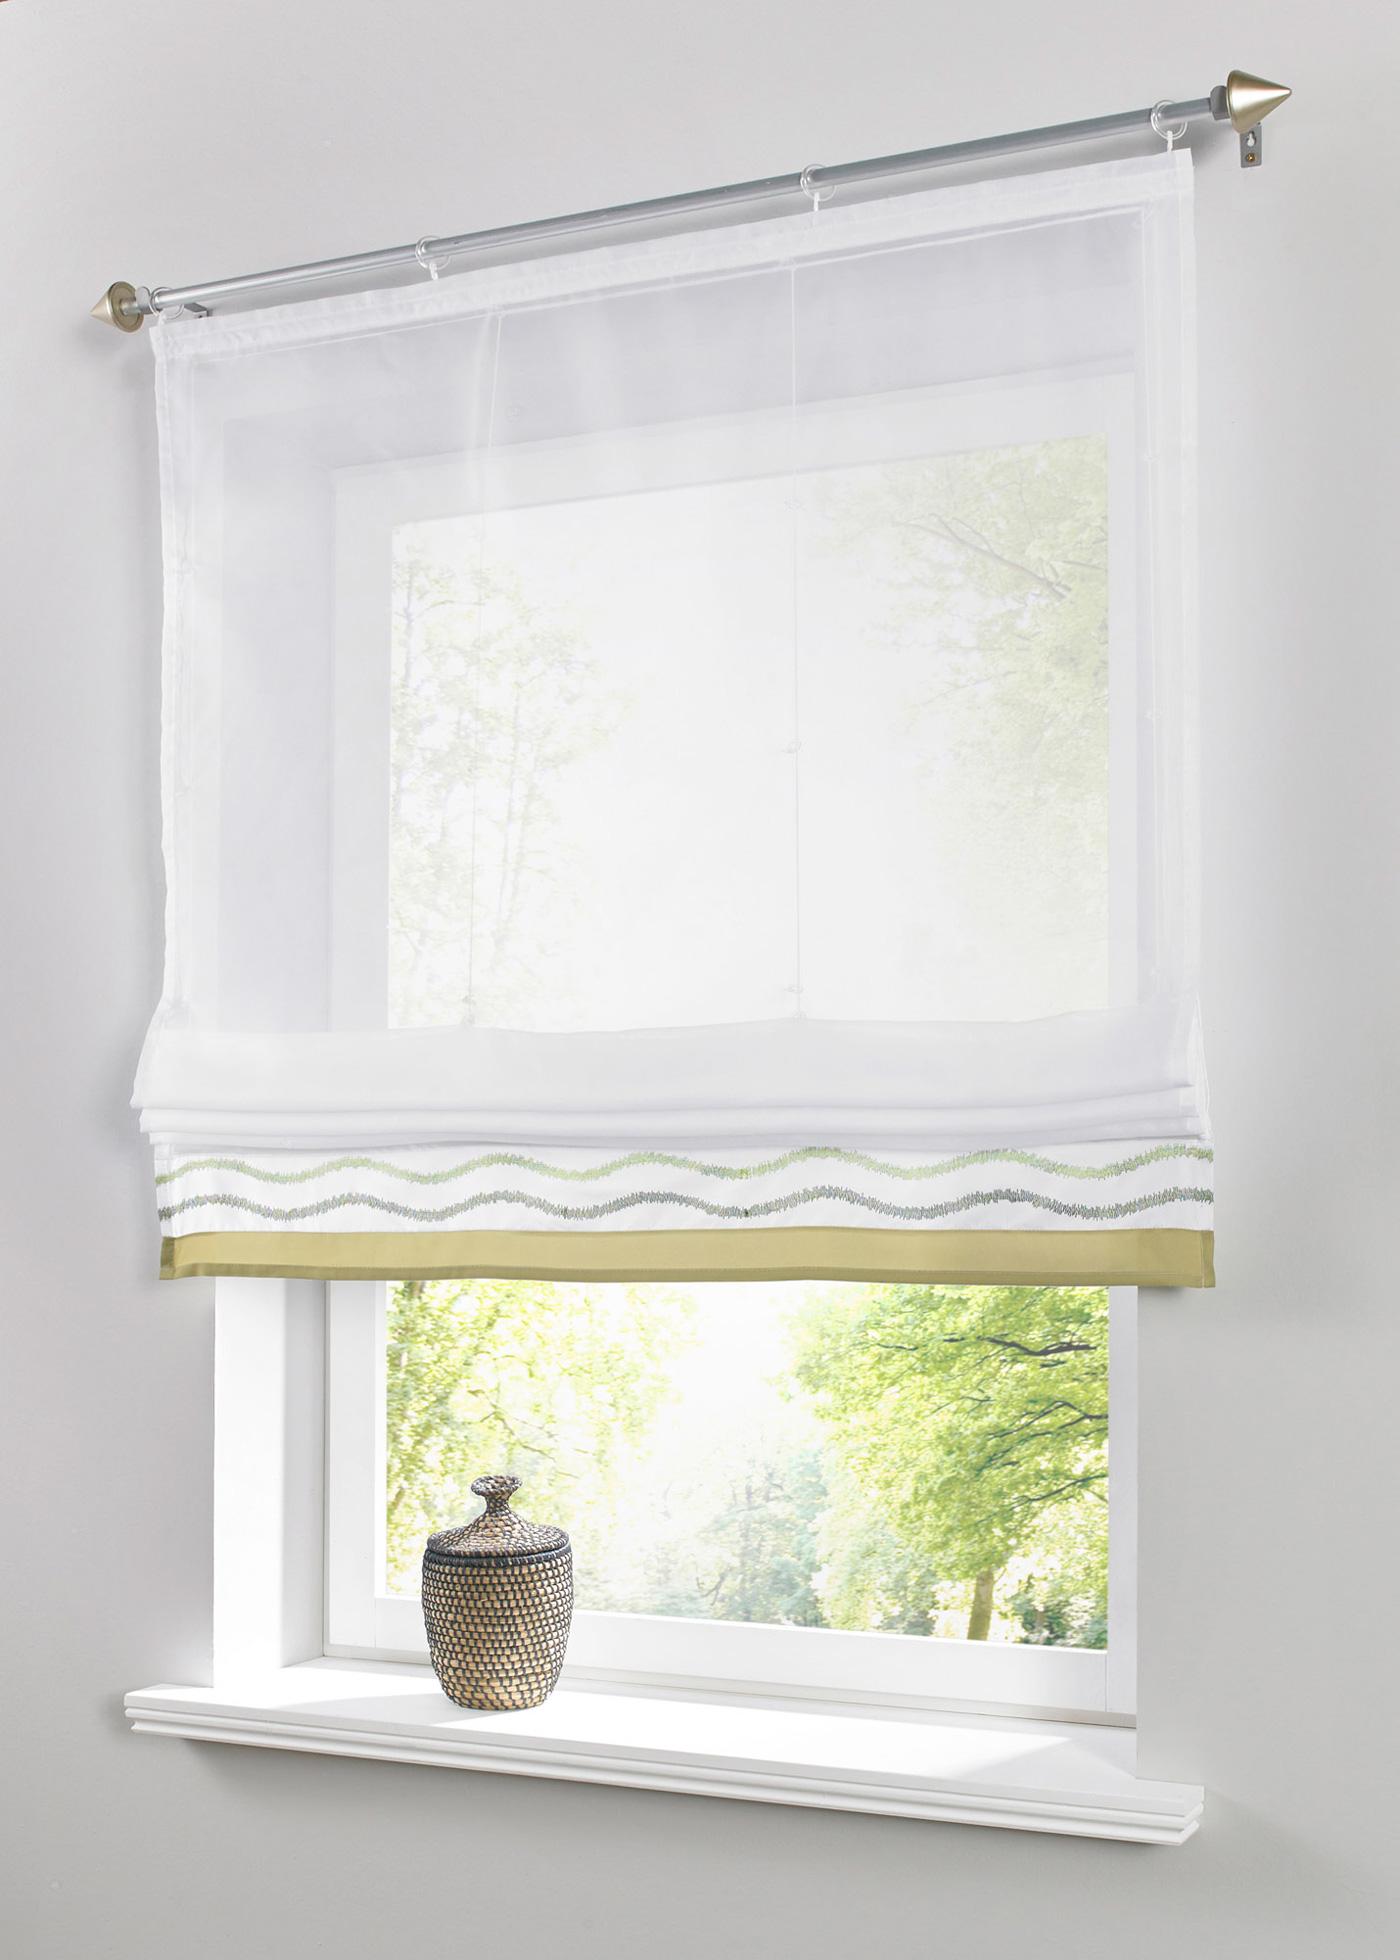 shopping portail free. Black Bedroom Furniture Sets. Home Design Ideas